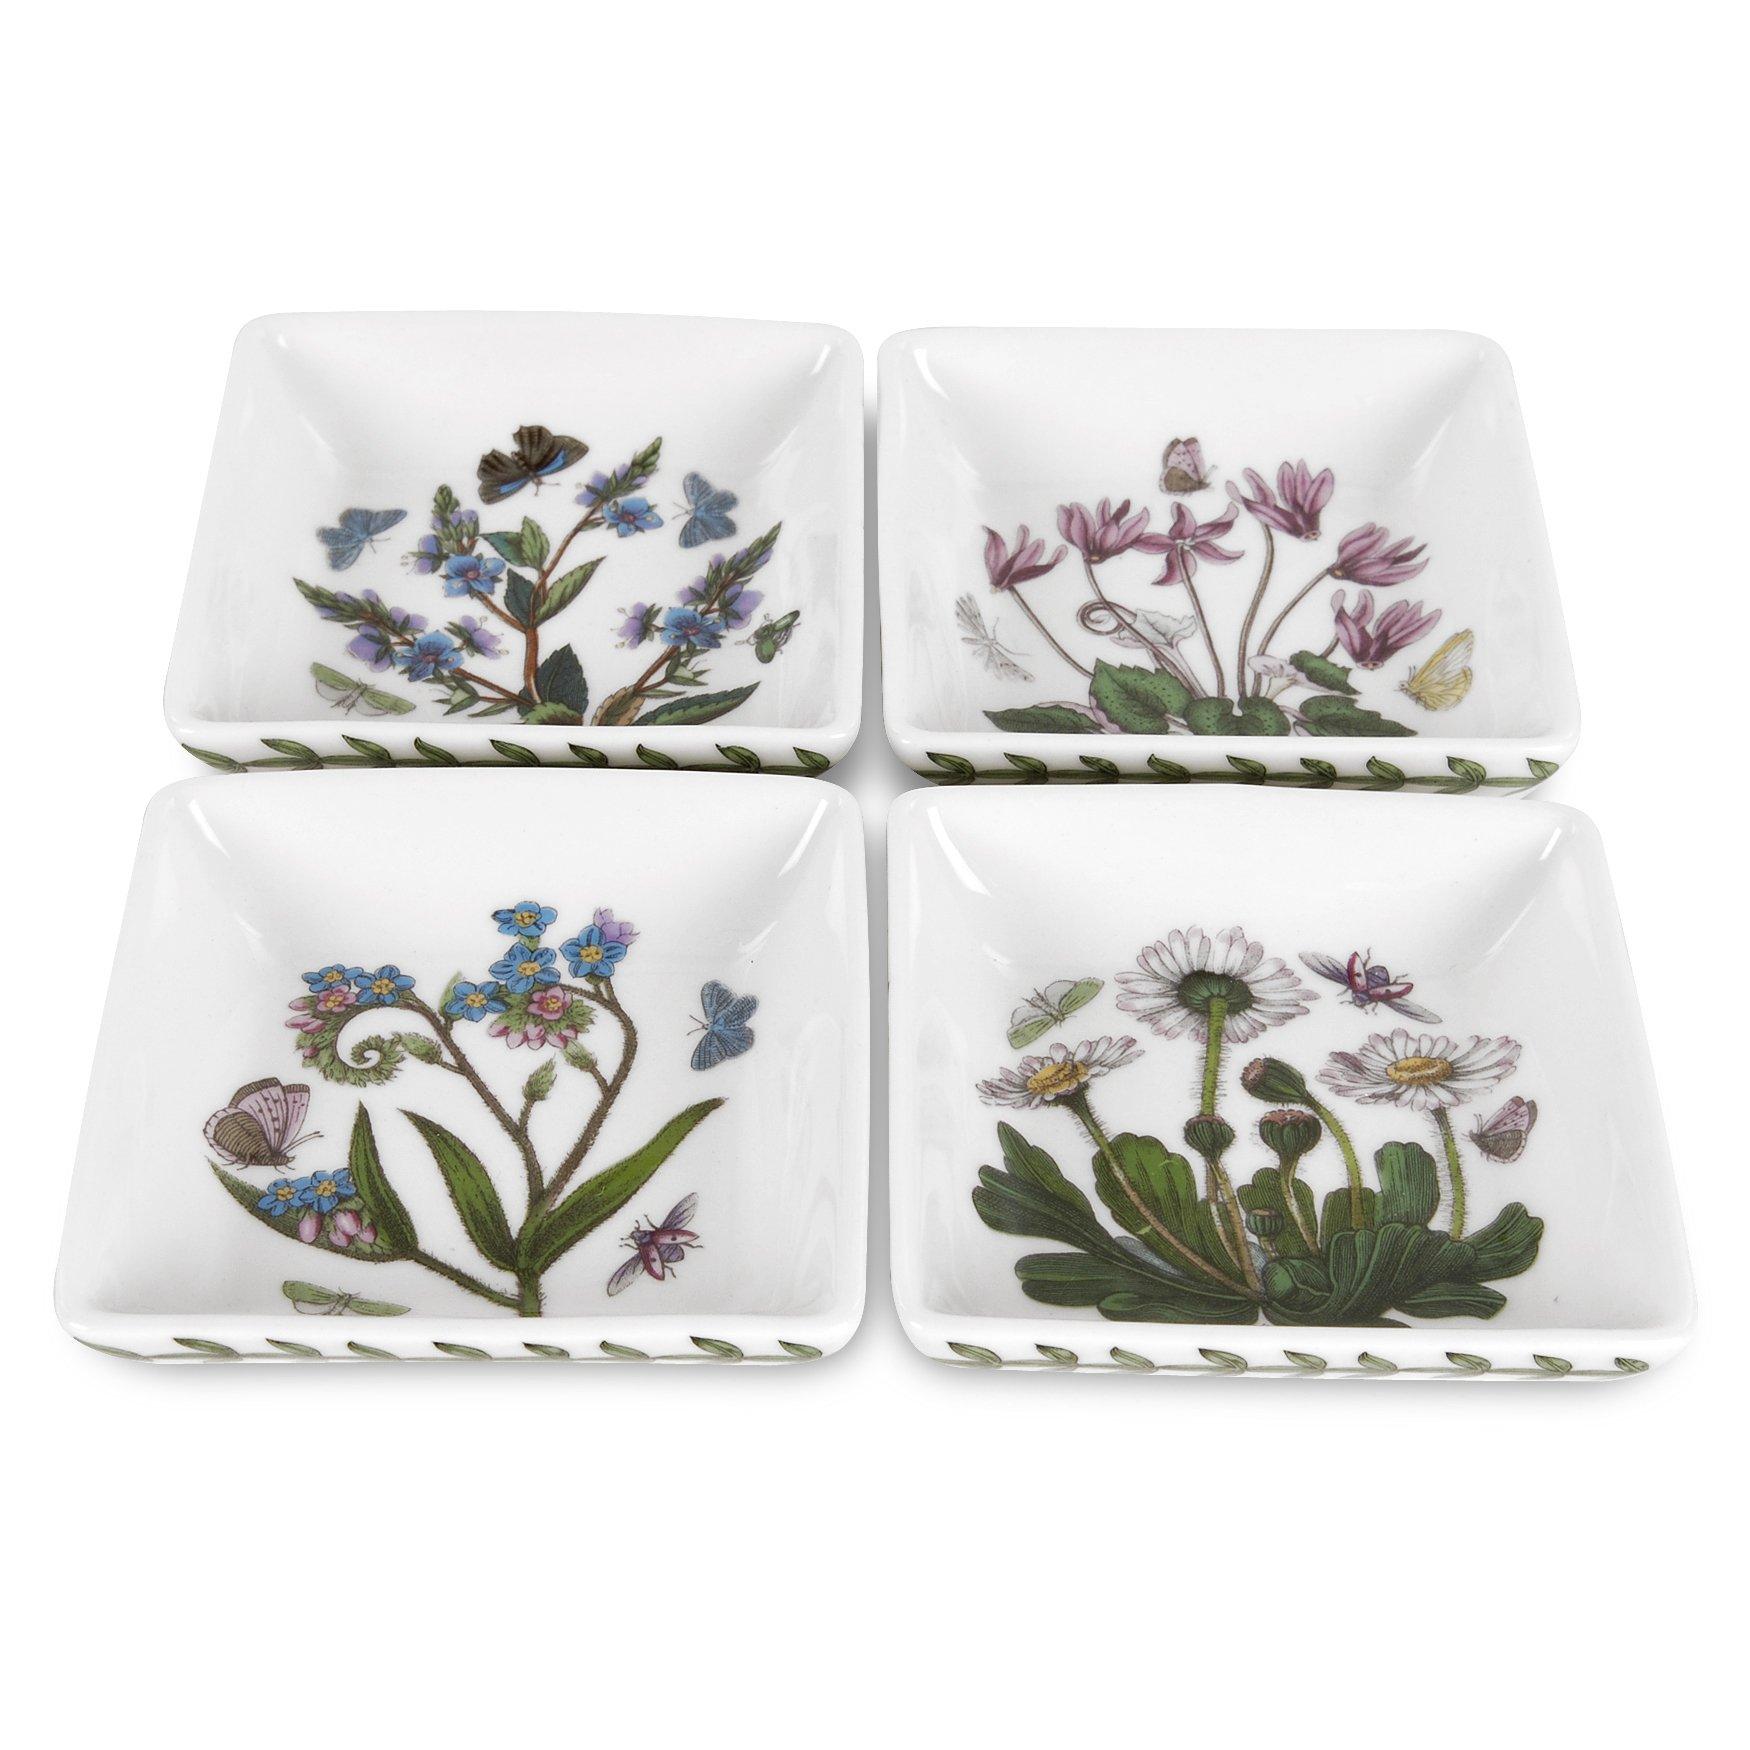 Portmeirion Botanic Garden 3-Inch Square Mini Dishes, Set of 4